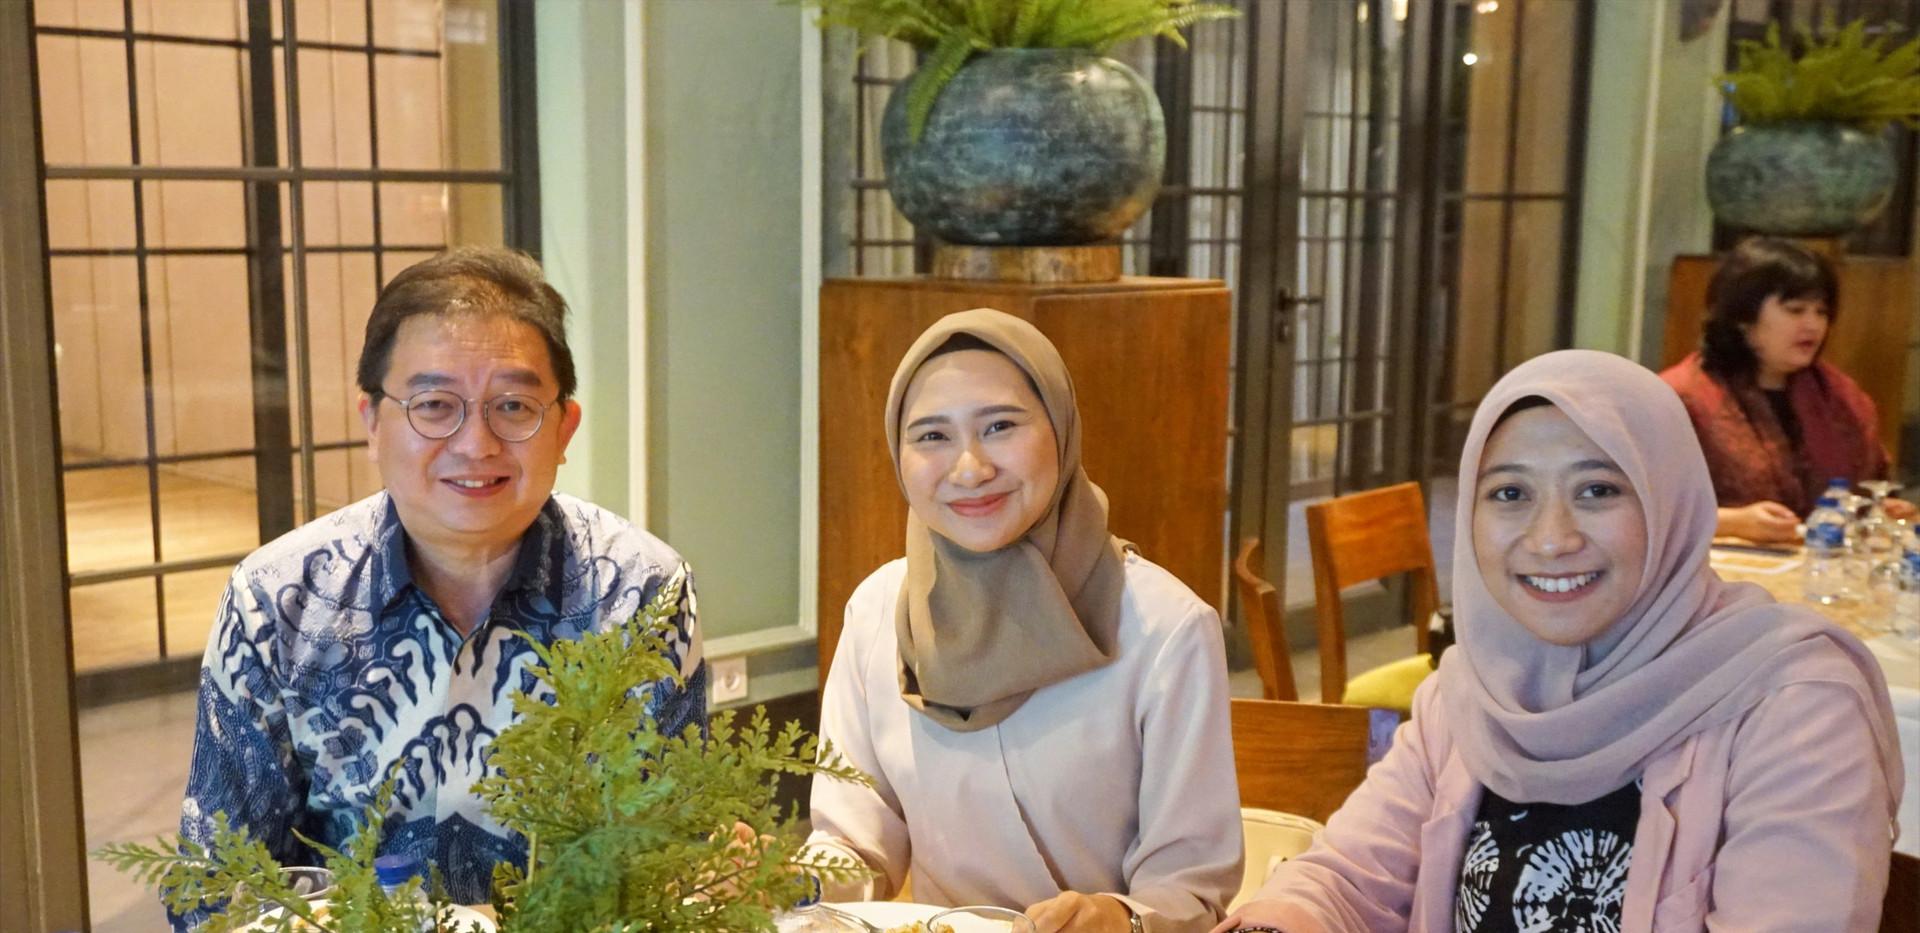 Bapak Jeffrey Bahar, Ibu Maudy Miya Andini dari Spire Research dan Ibu Annisa Noyara dari Pendiri Tay Juhana juga menghadiri Gala Dinner CIPS.